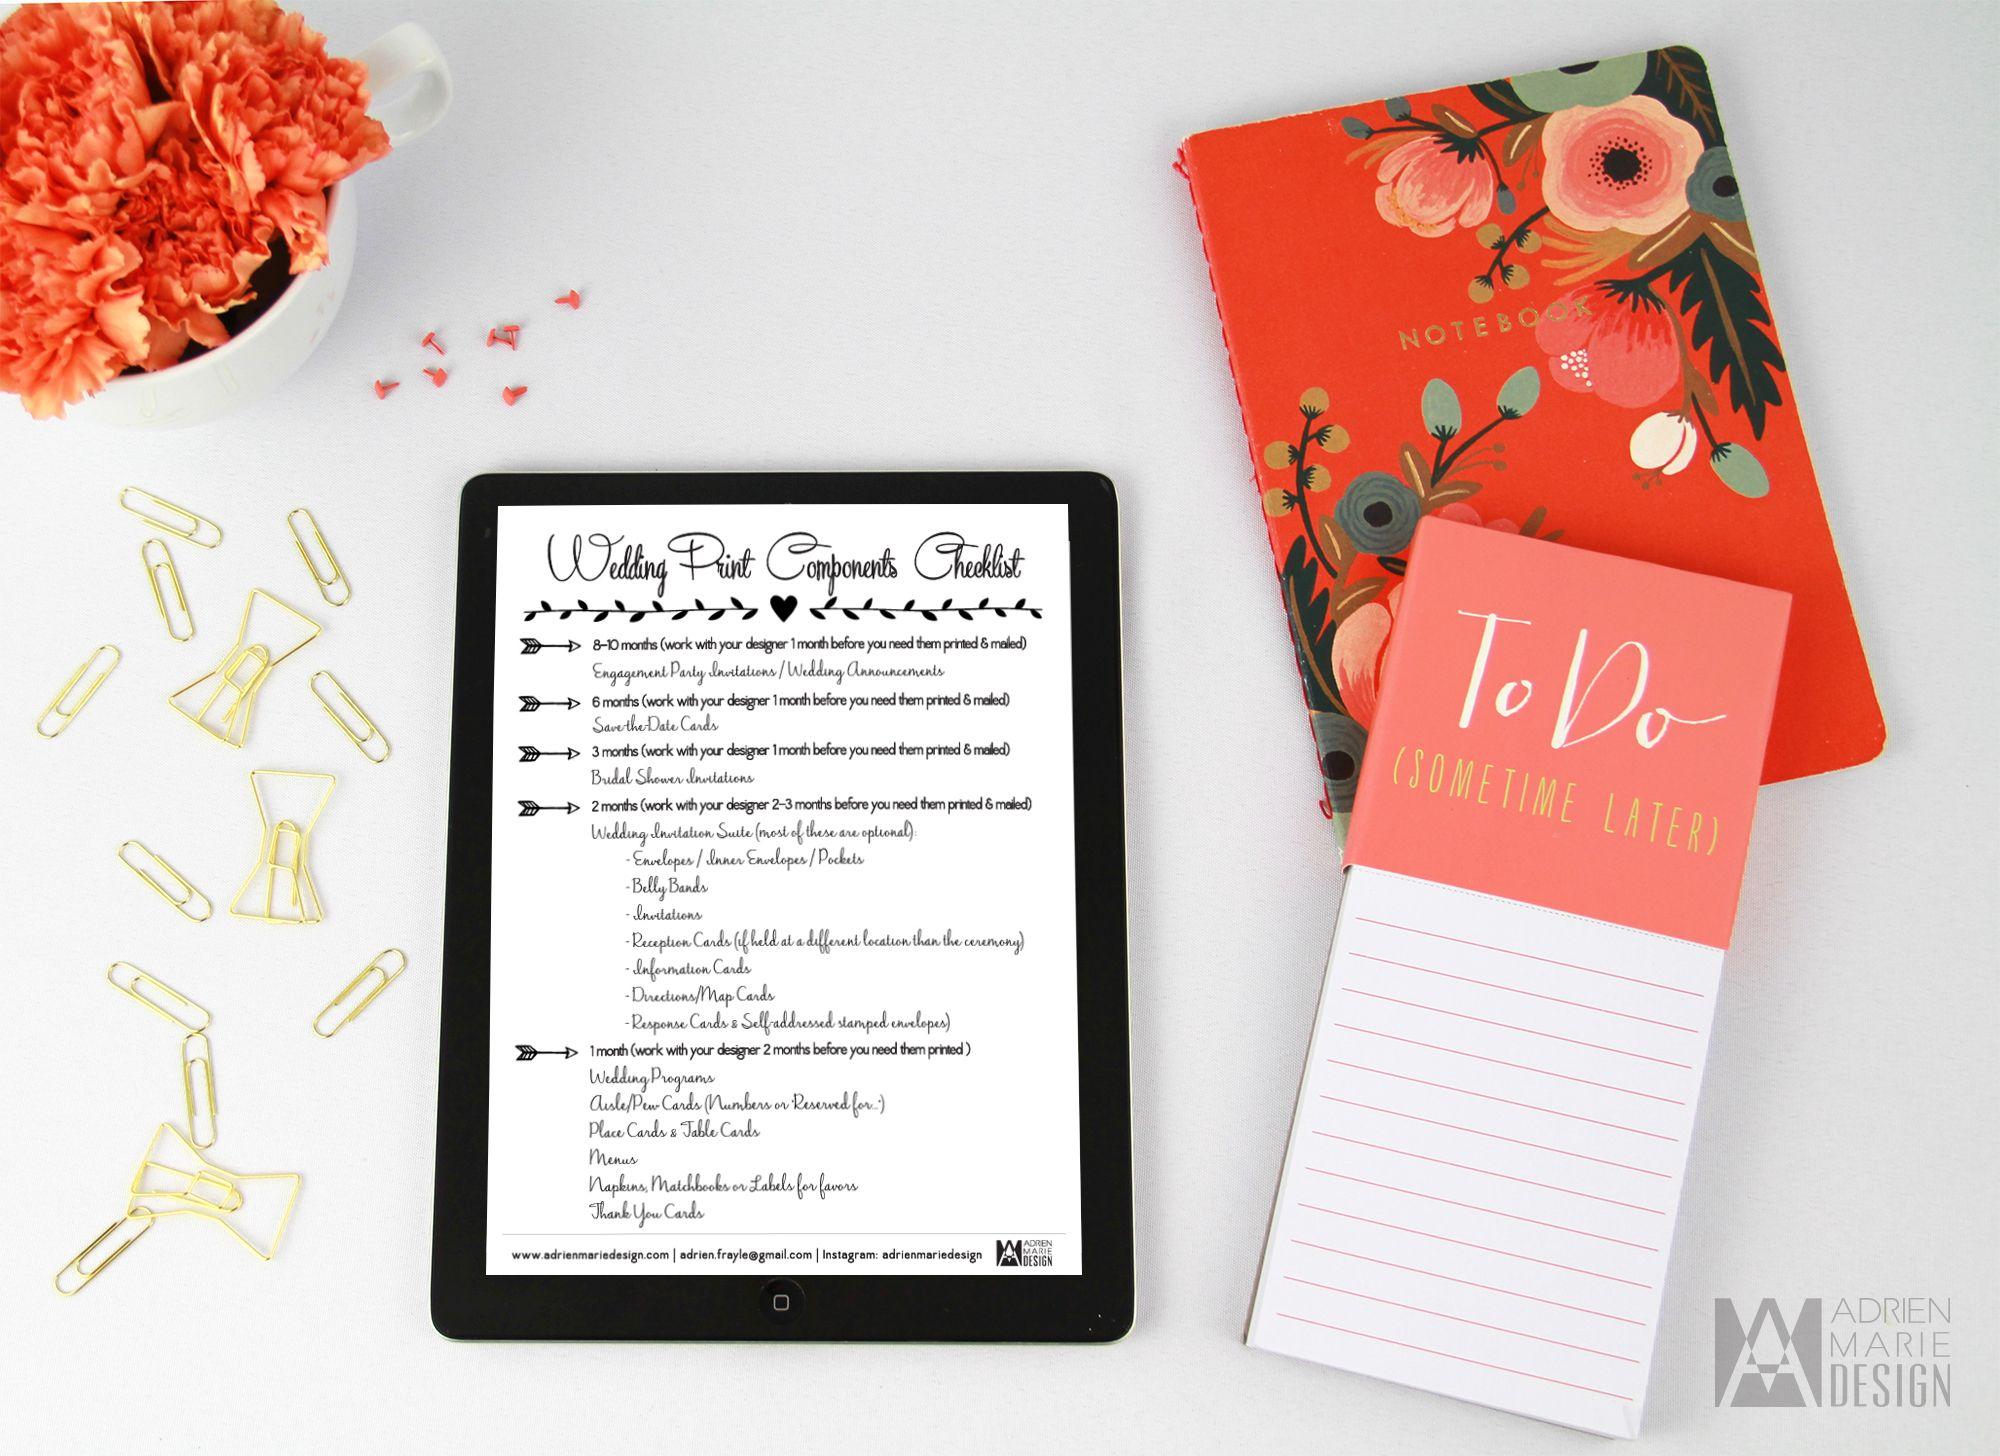 HOME Blogging courses, Free blogging courses, Blog